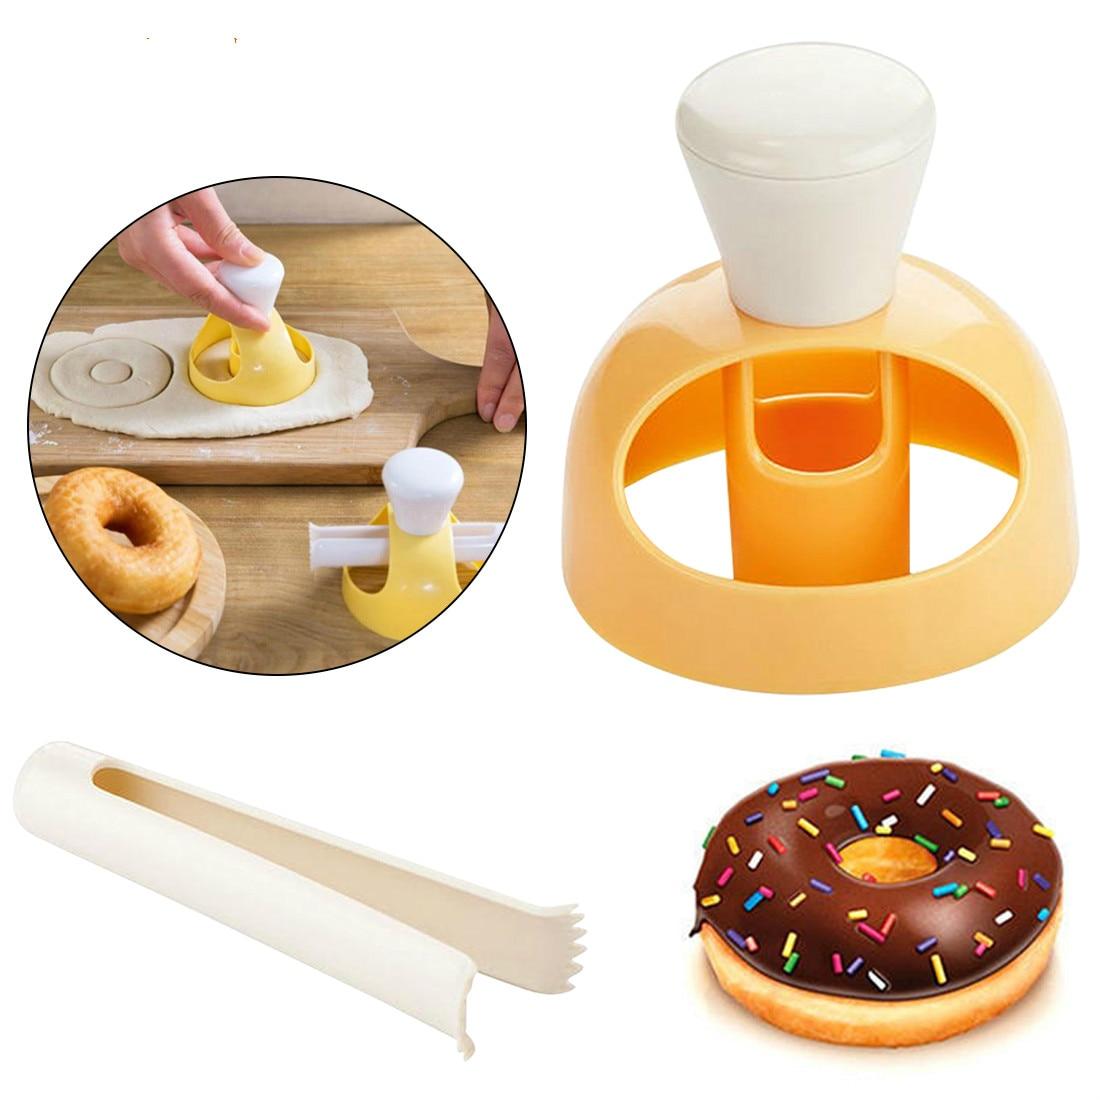 Donut Maker Mold Fondant Cake Bakery Doughnut DIY Fried Donut Maker Cutter Silicone Mold Chocolates Cake Decorating Tools